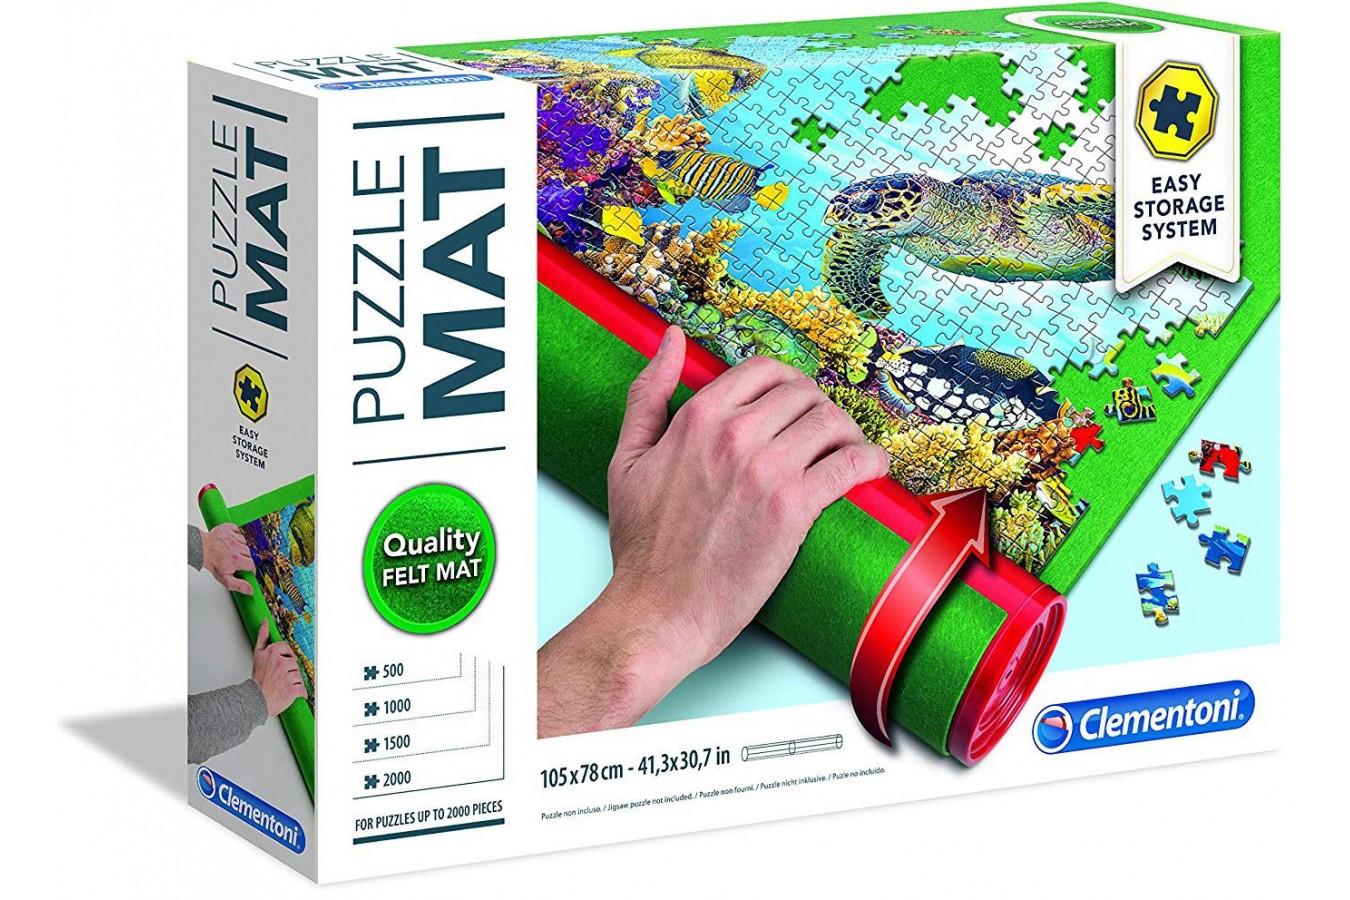 Puzzle Clementoni - Covor Pentru Rulat Puzzle 500-2000 Piese (30229) imagine